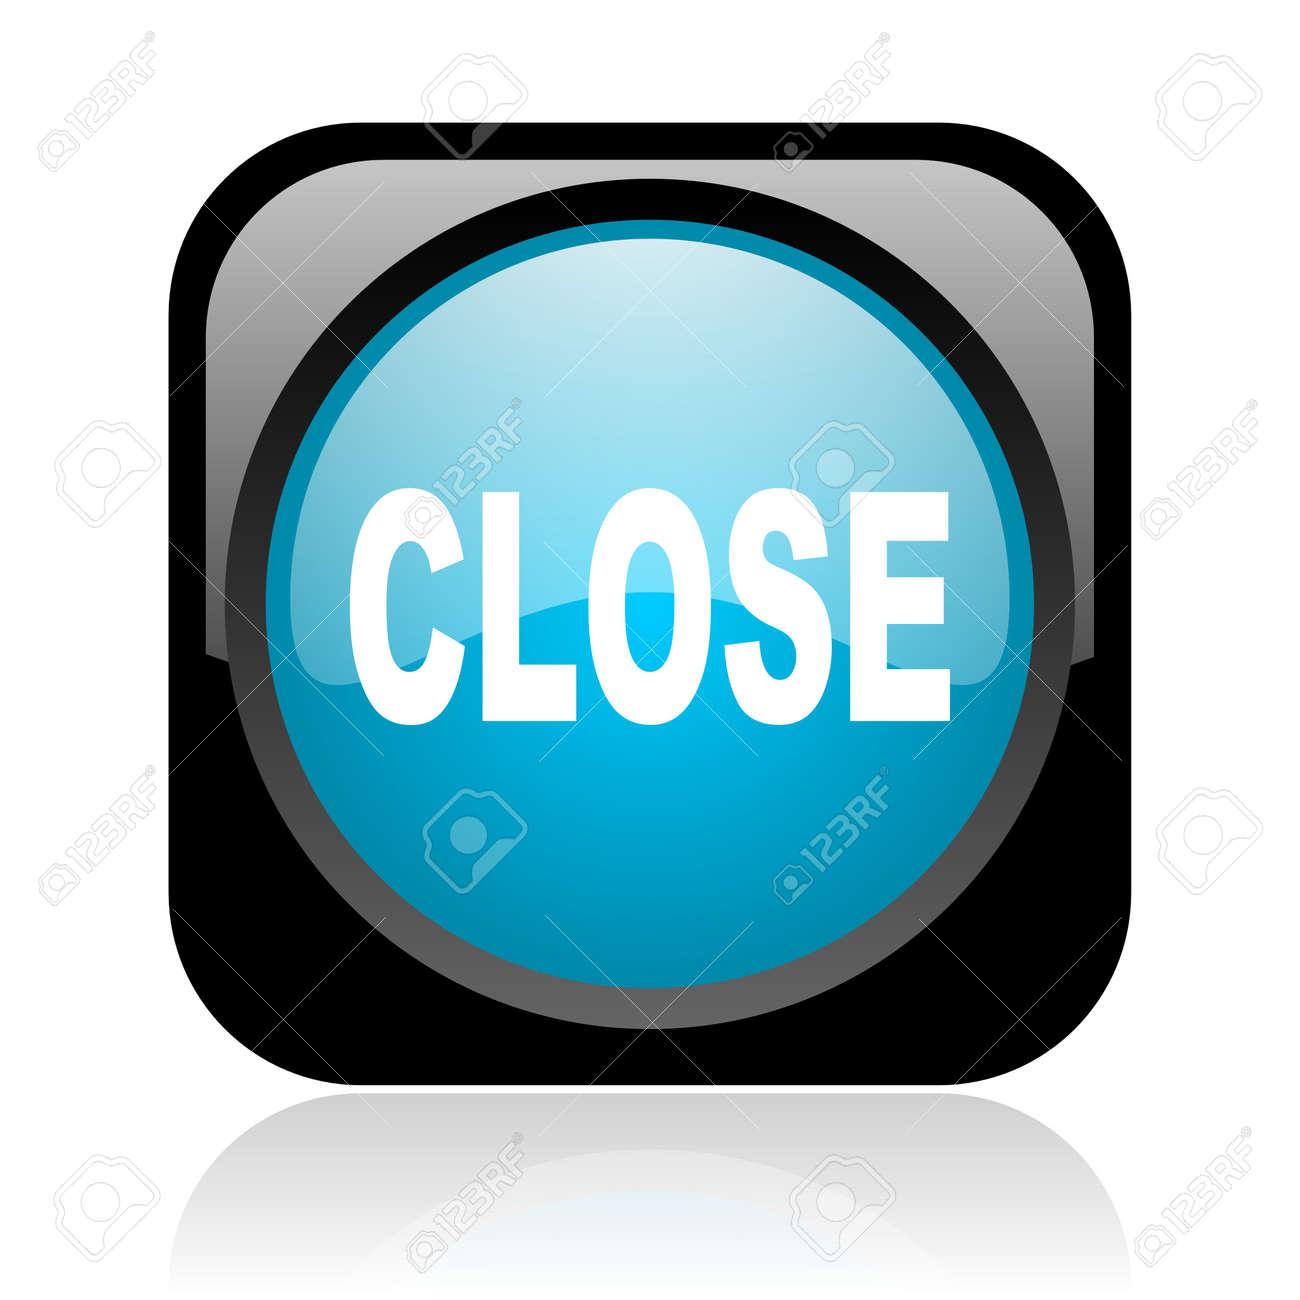 close black and blue square web glossy icon Stock Photo - 18917840